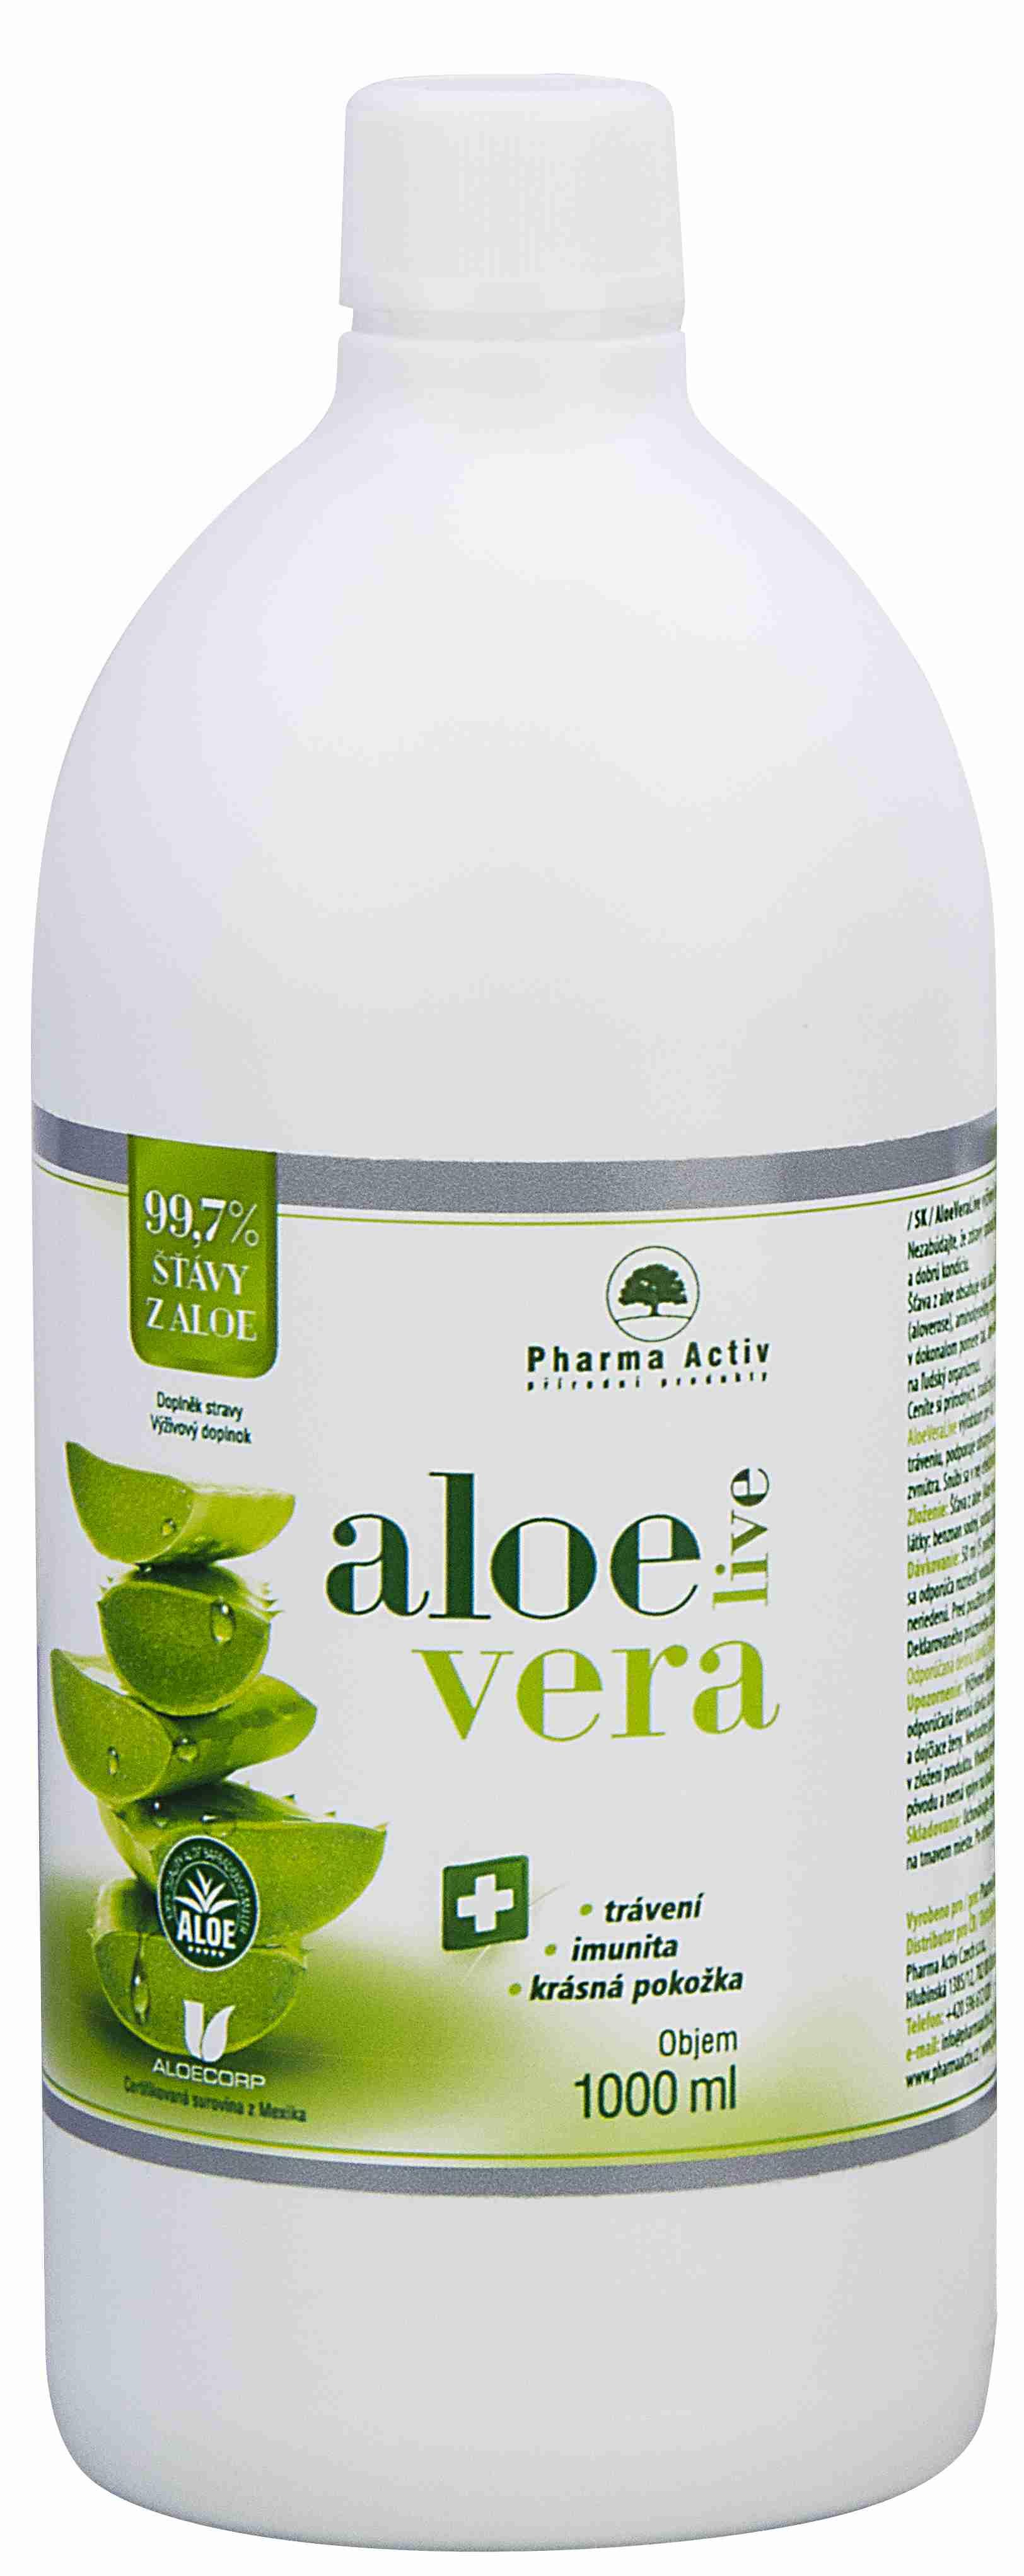 Pharma Activ AloeVeraLive 1000 ml